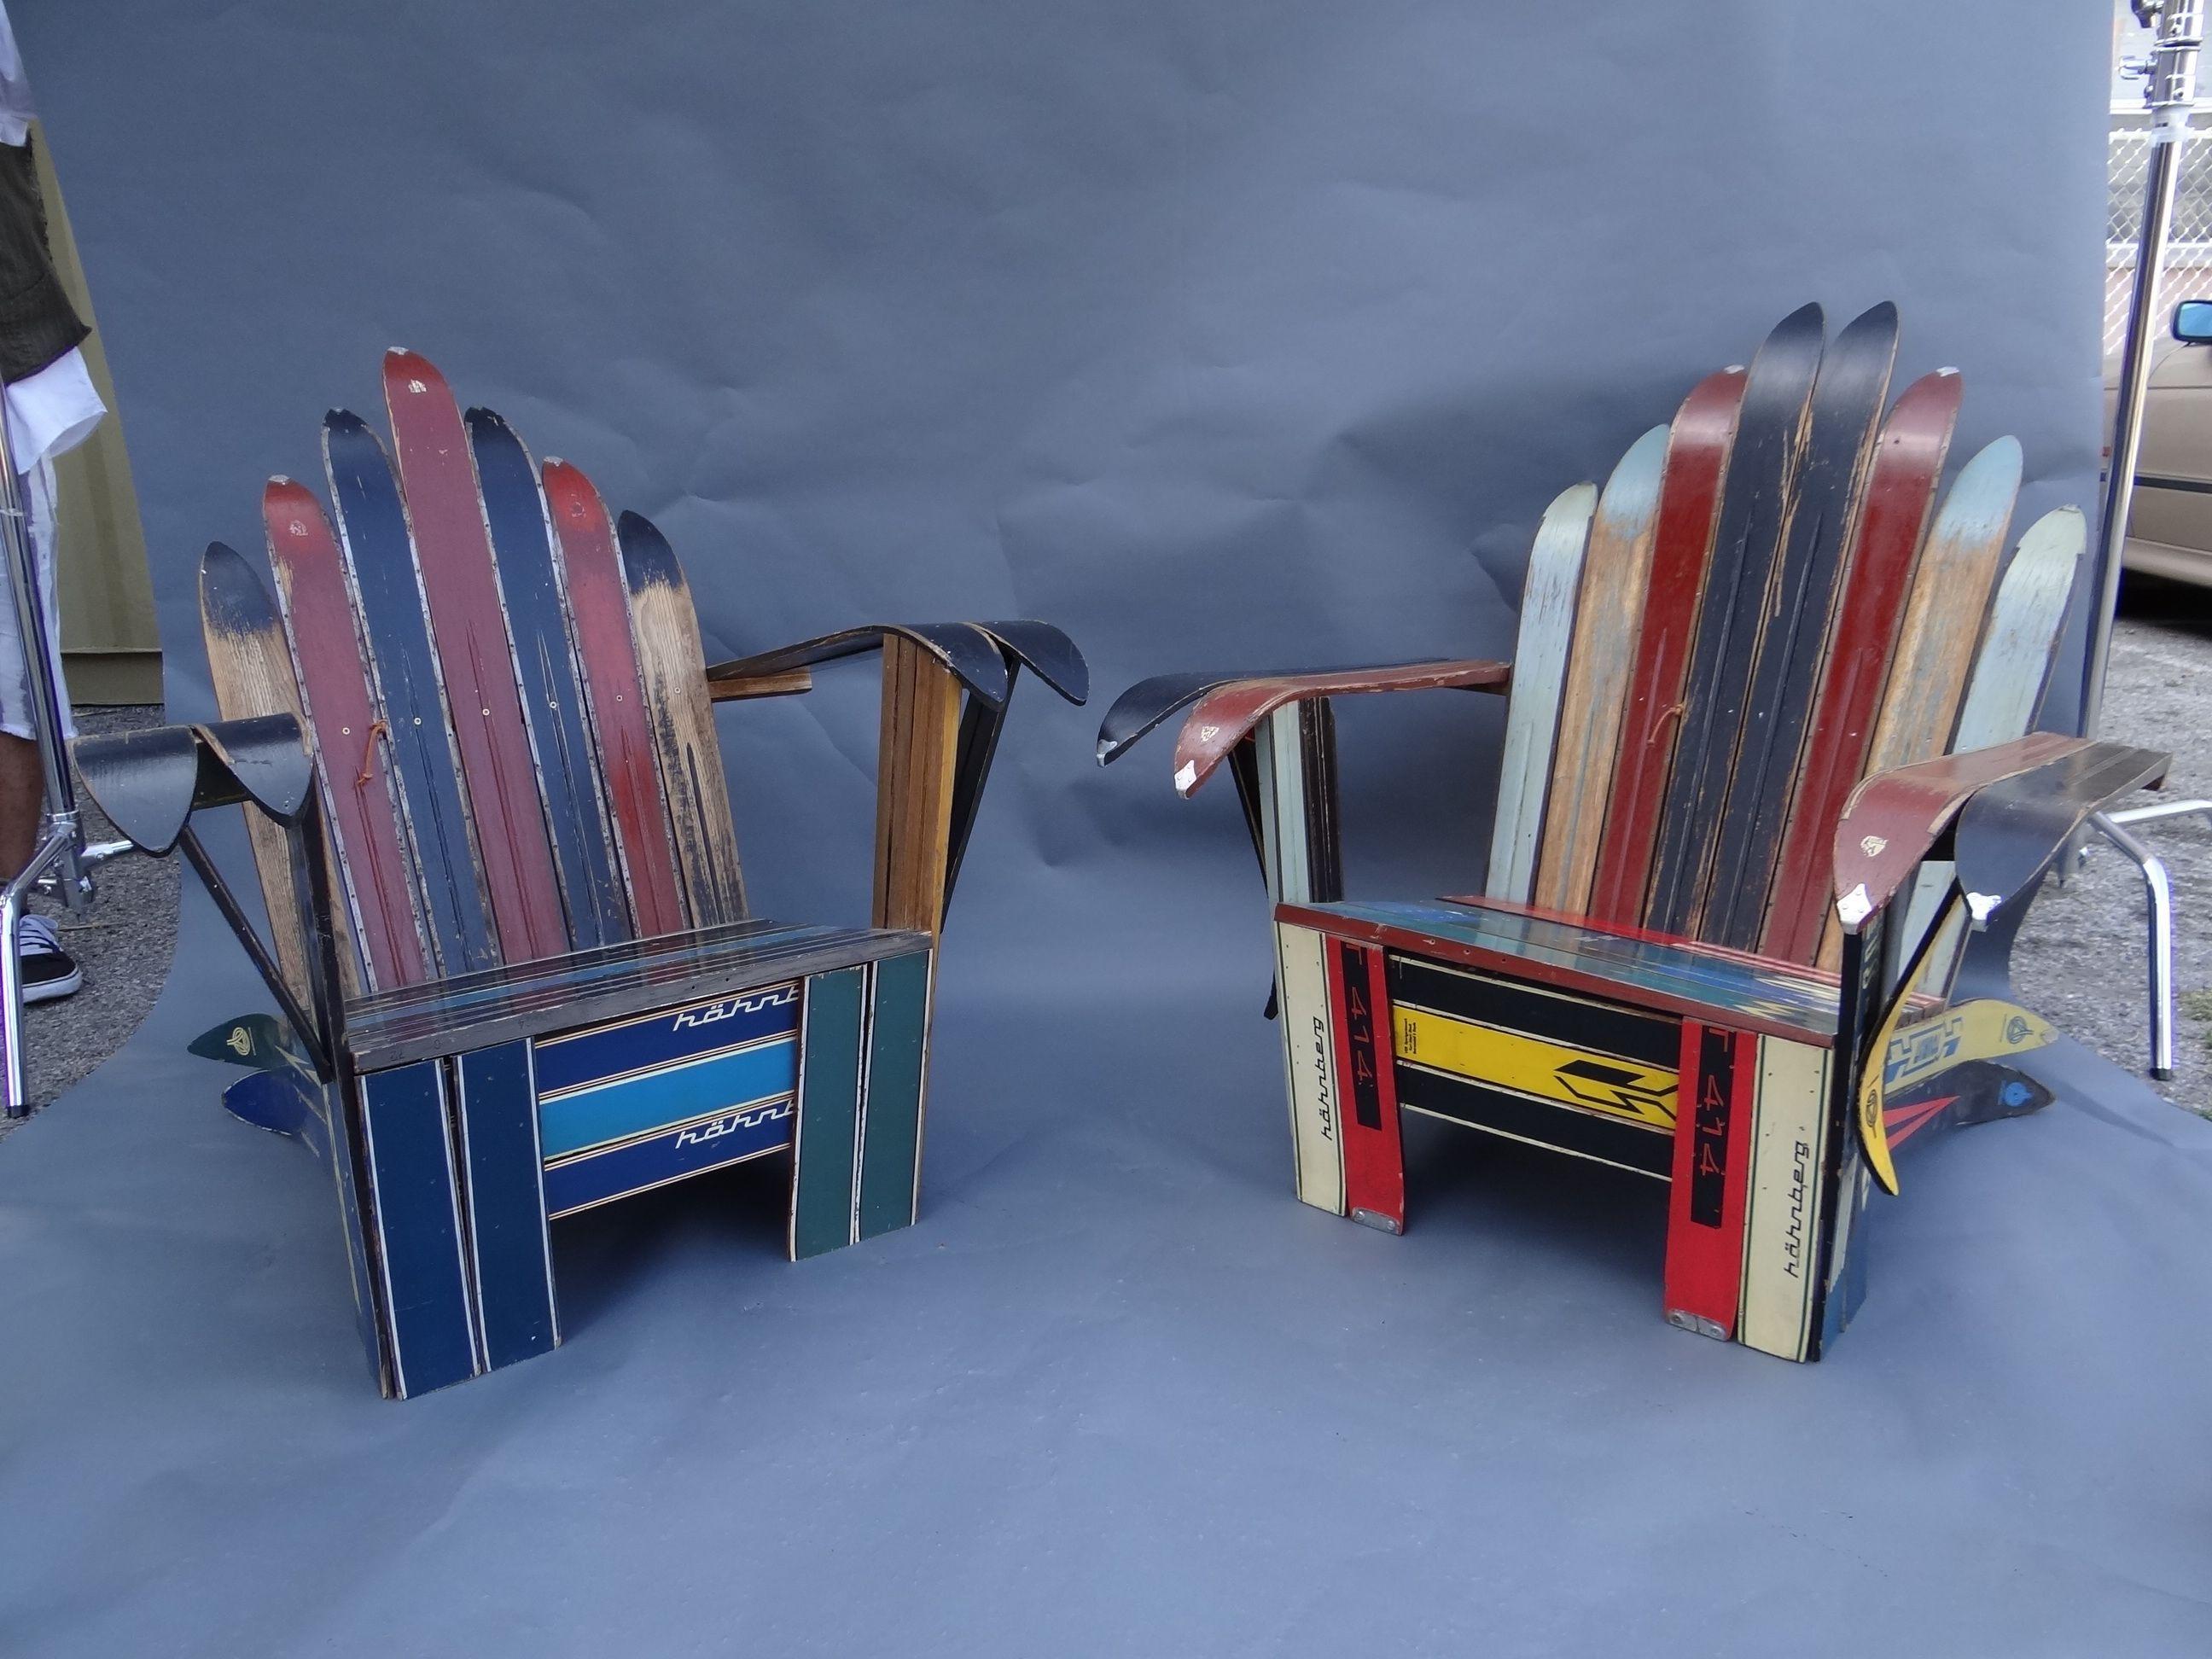 Stupendous Diy Ski Airondack Chairs For Dave Adirondack Chairs Download Free Architecture Designs Oxytwazosbritishbridgeorg